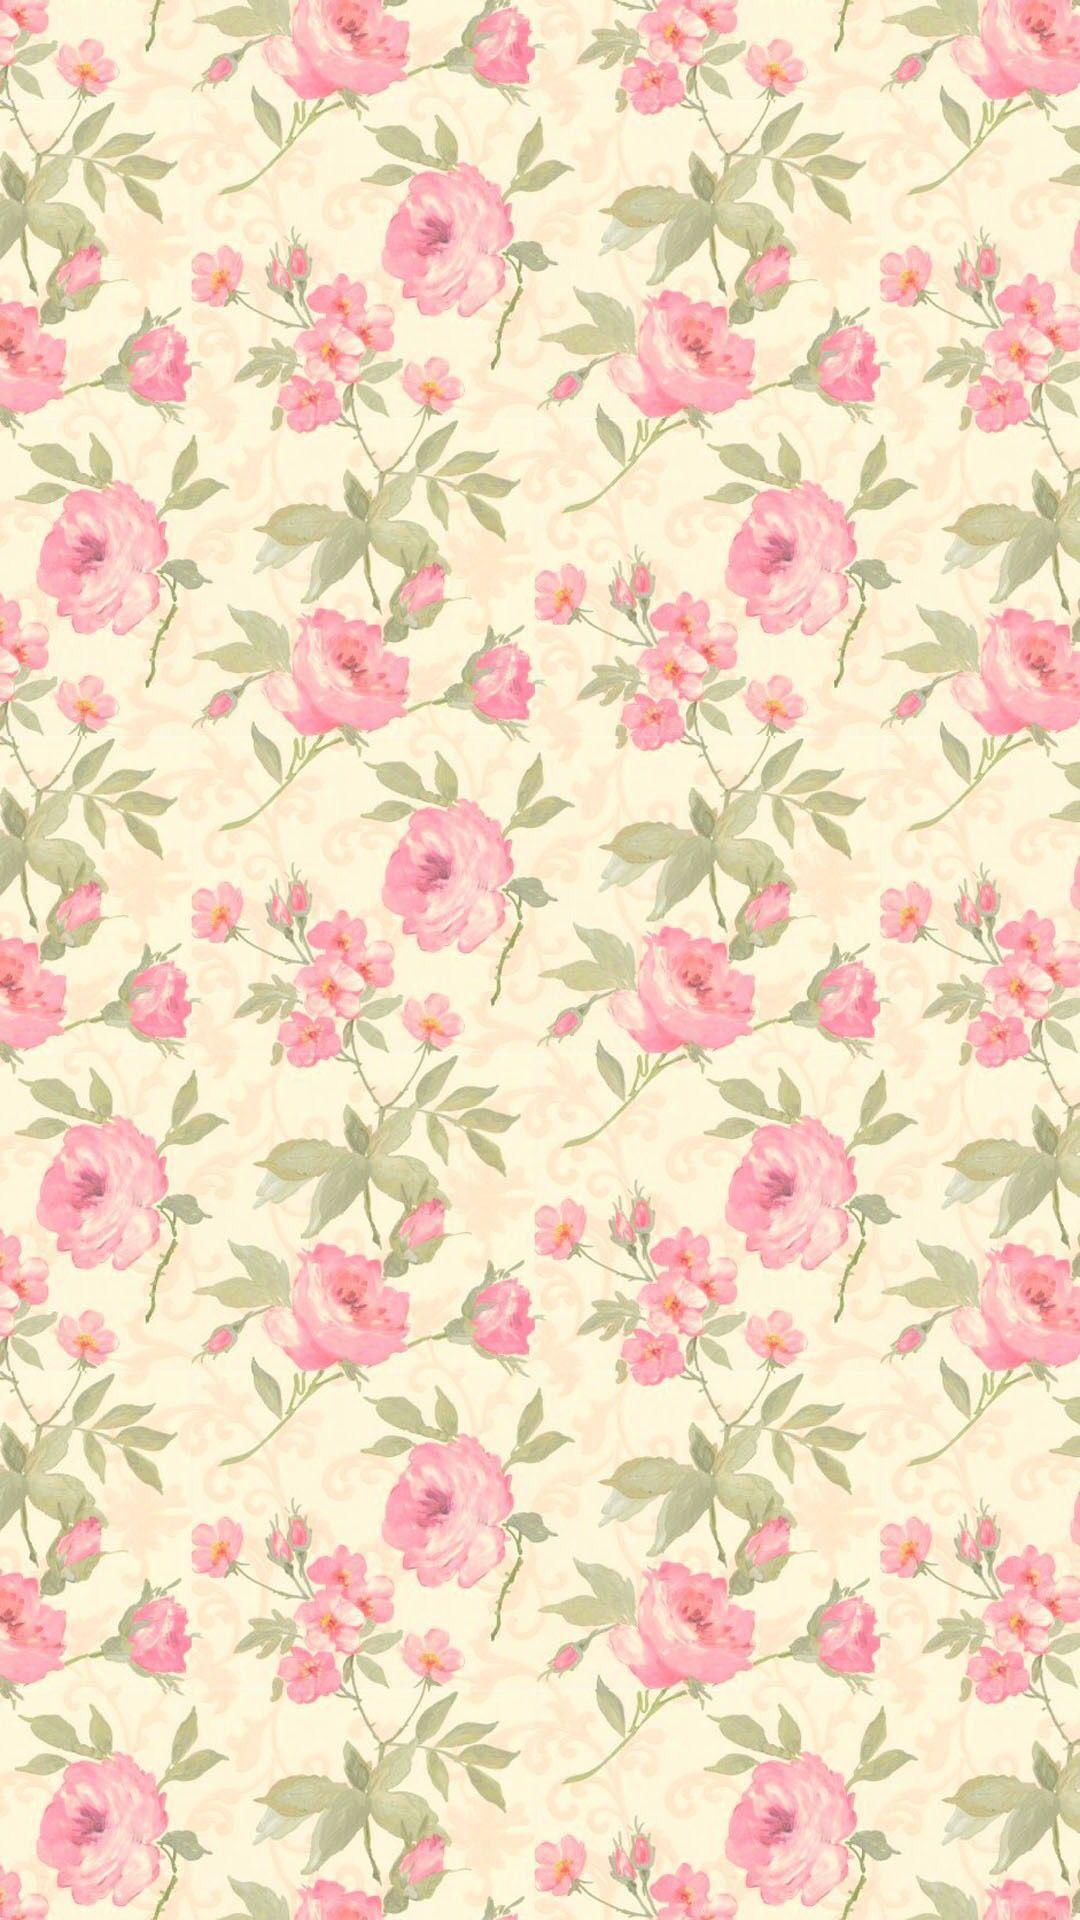 Fall Disney Iphone Wallpaper Pin By Estelle Hamman On 1 Art Floral Pinterest